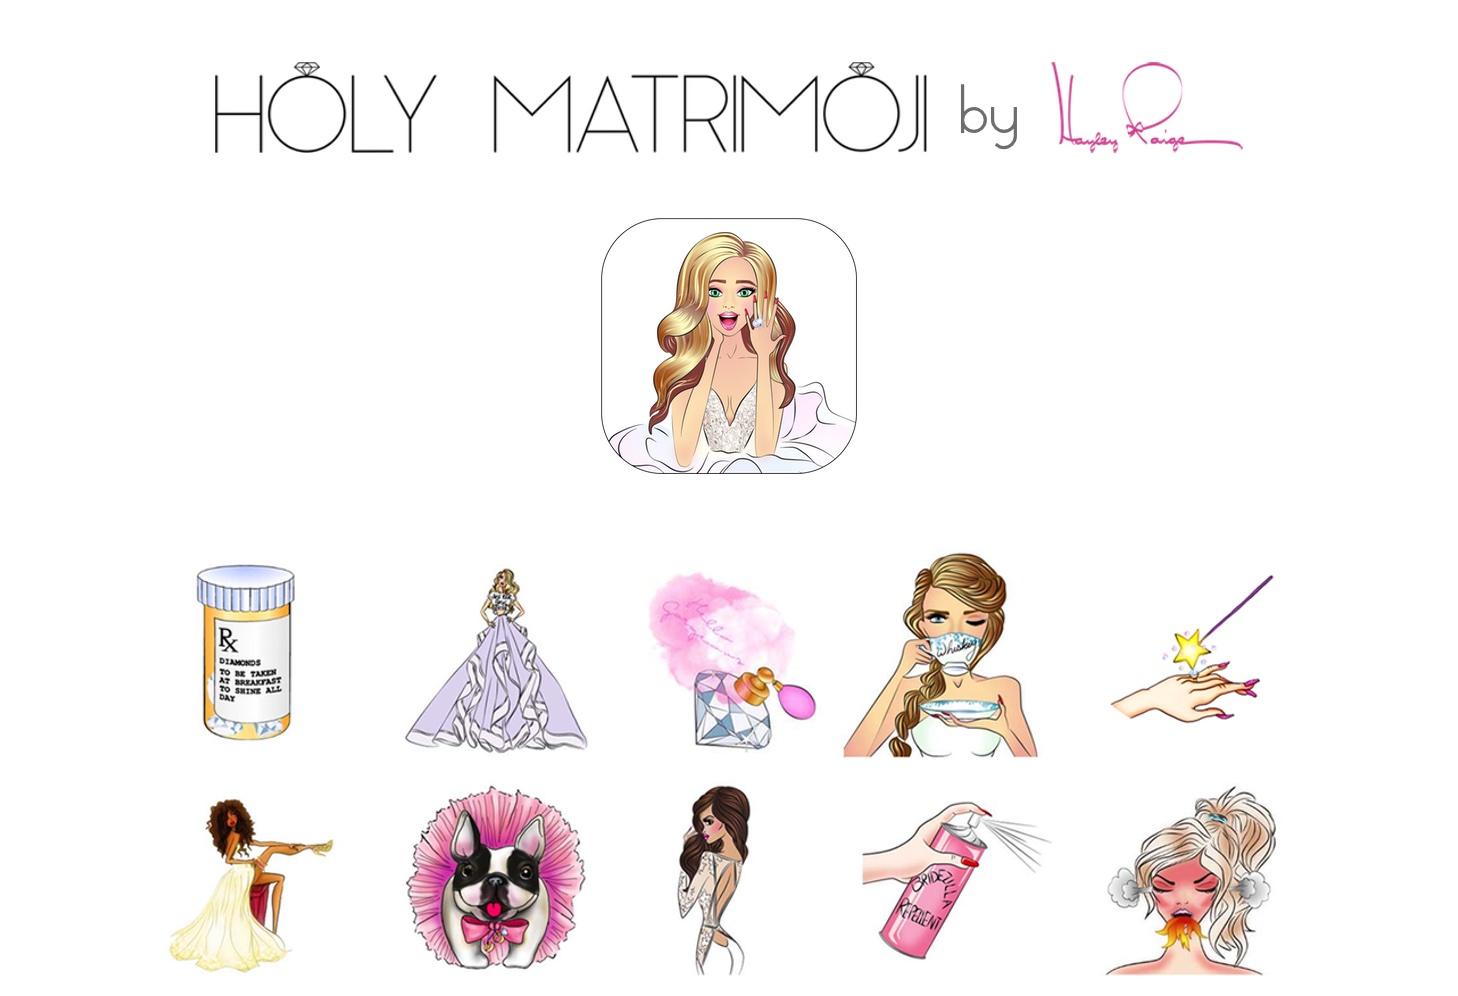 HOLY MATRIMOJI